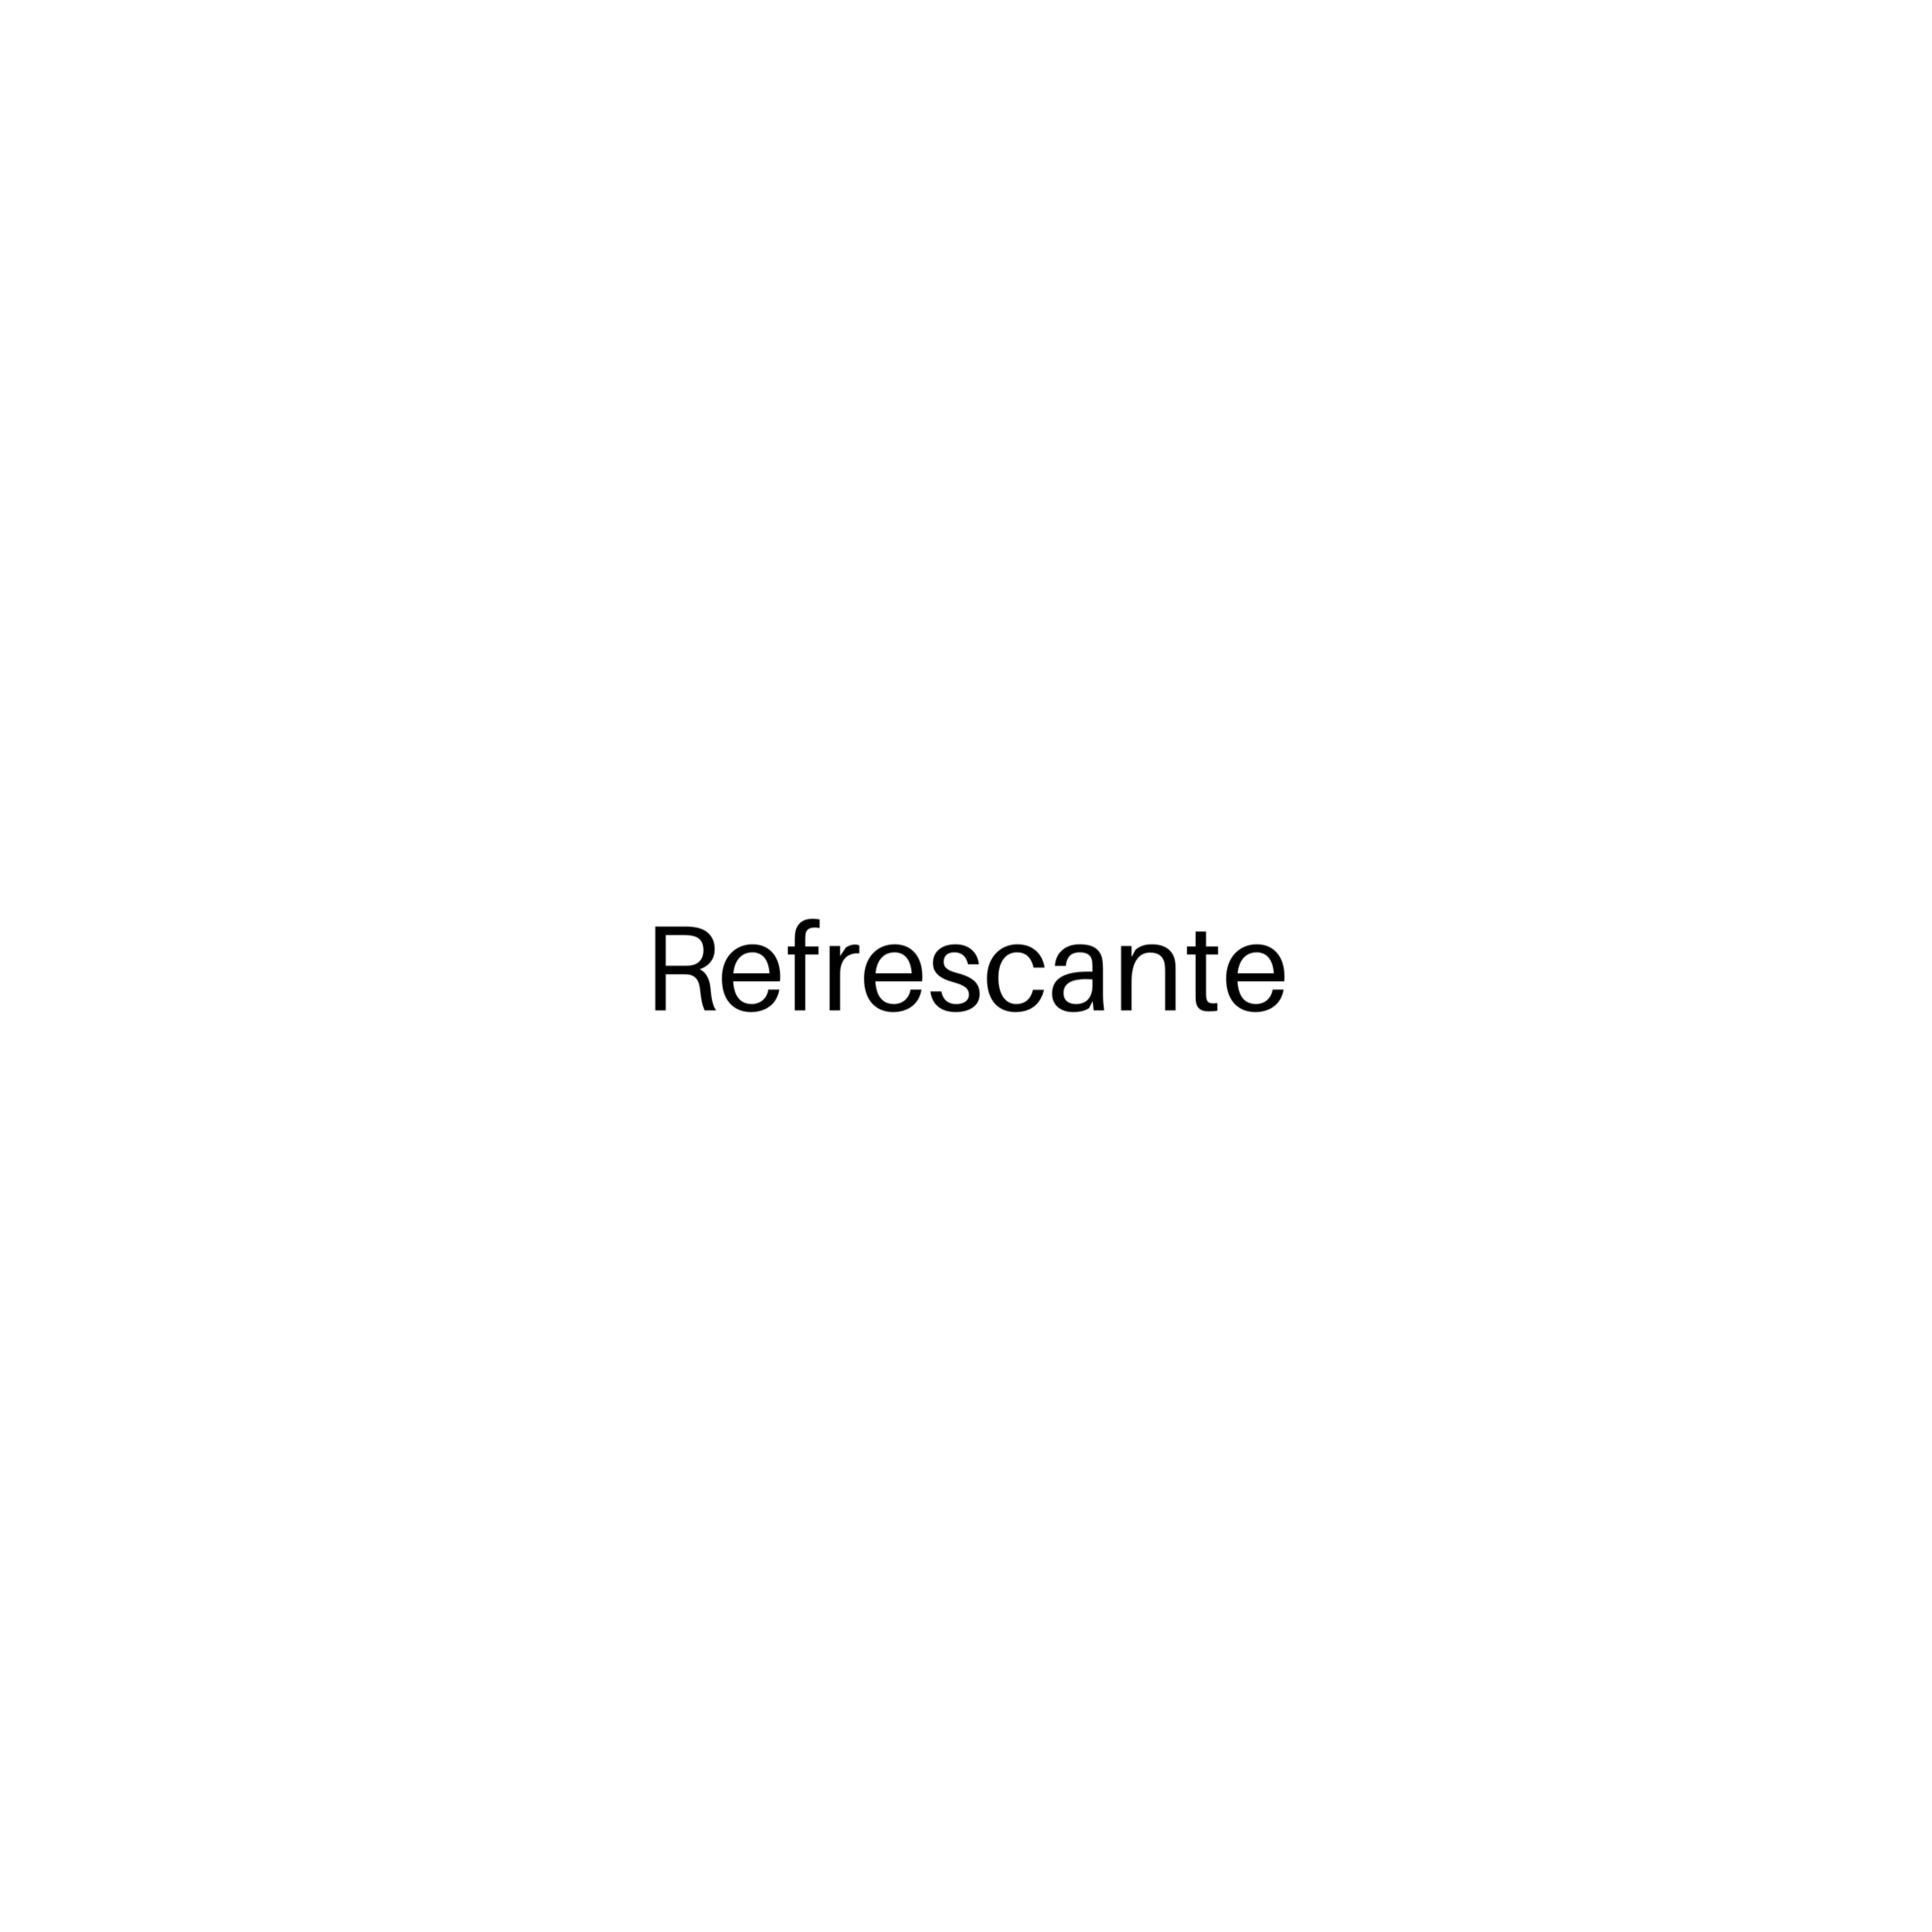 REFRESCANTE